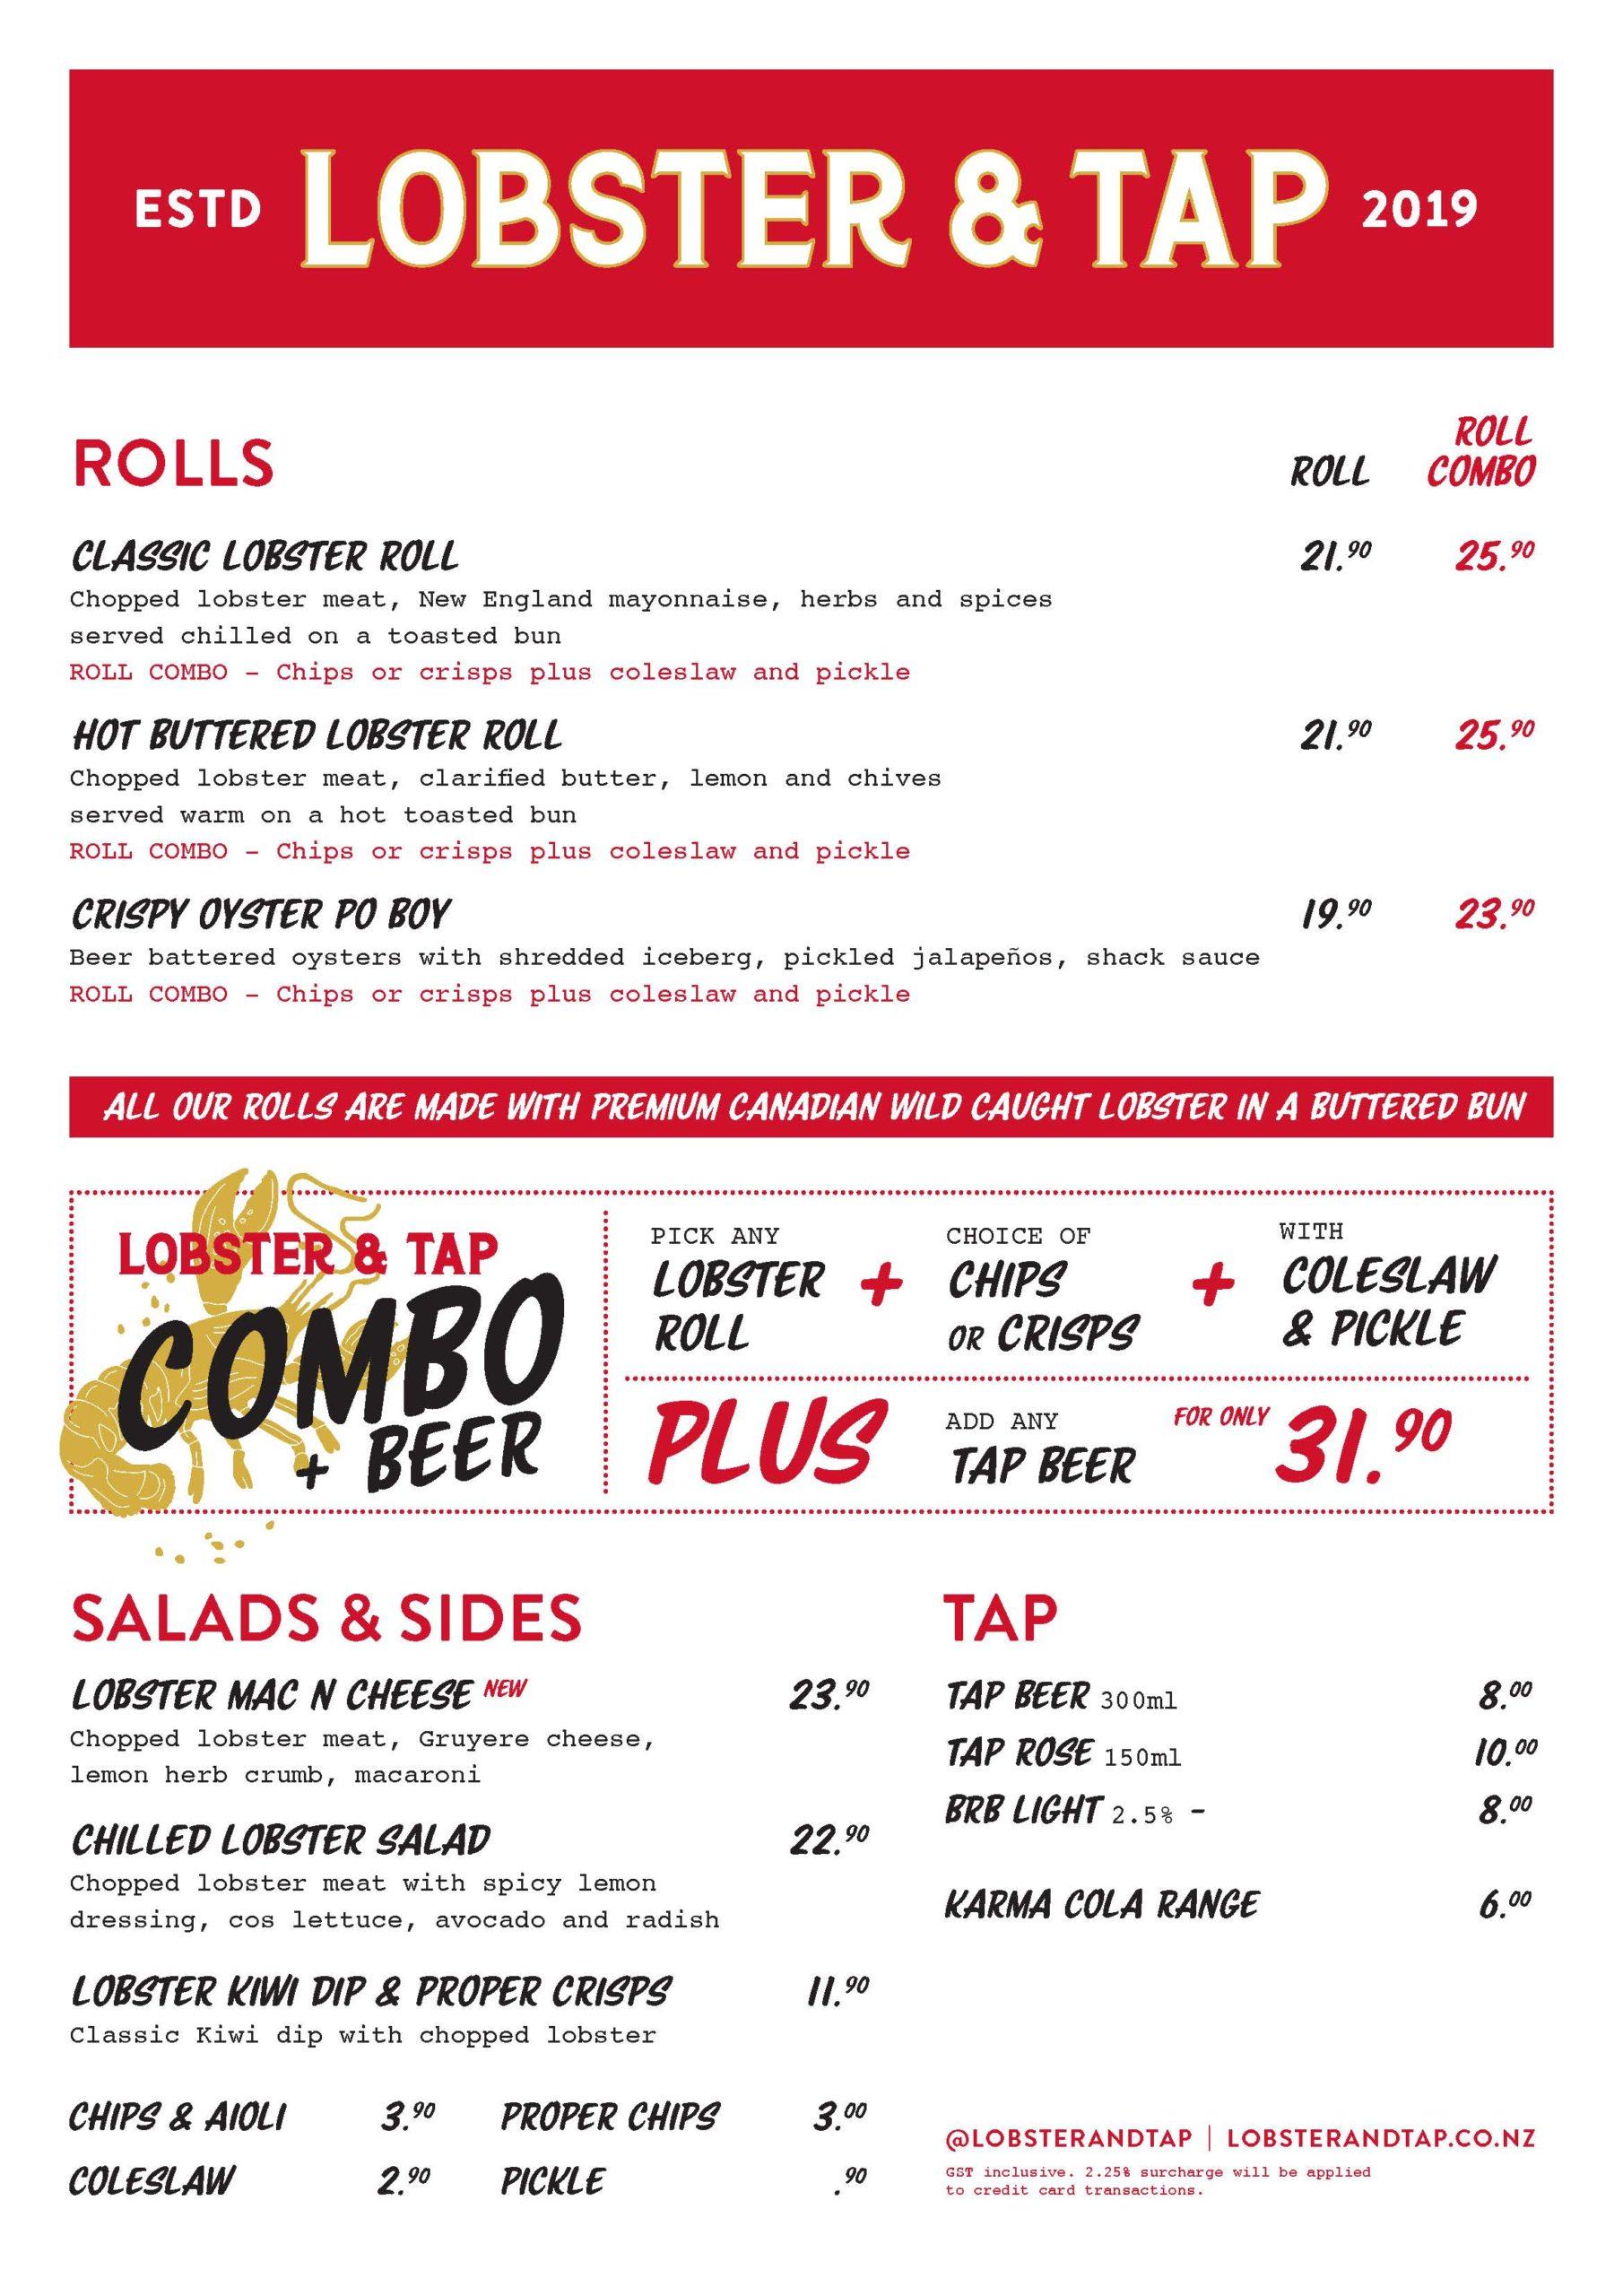 Lobster and Tap menu